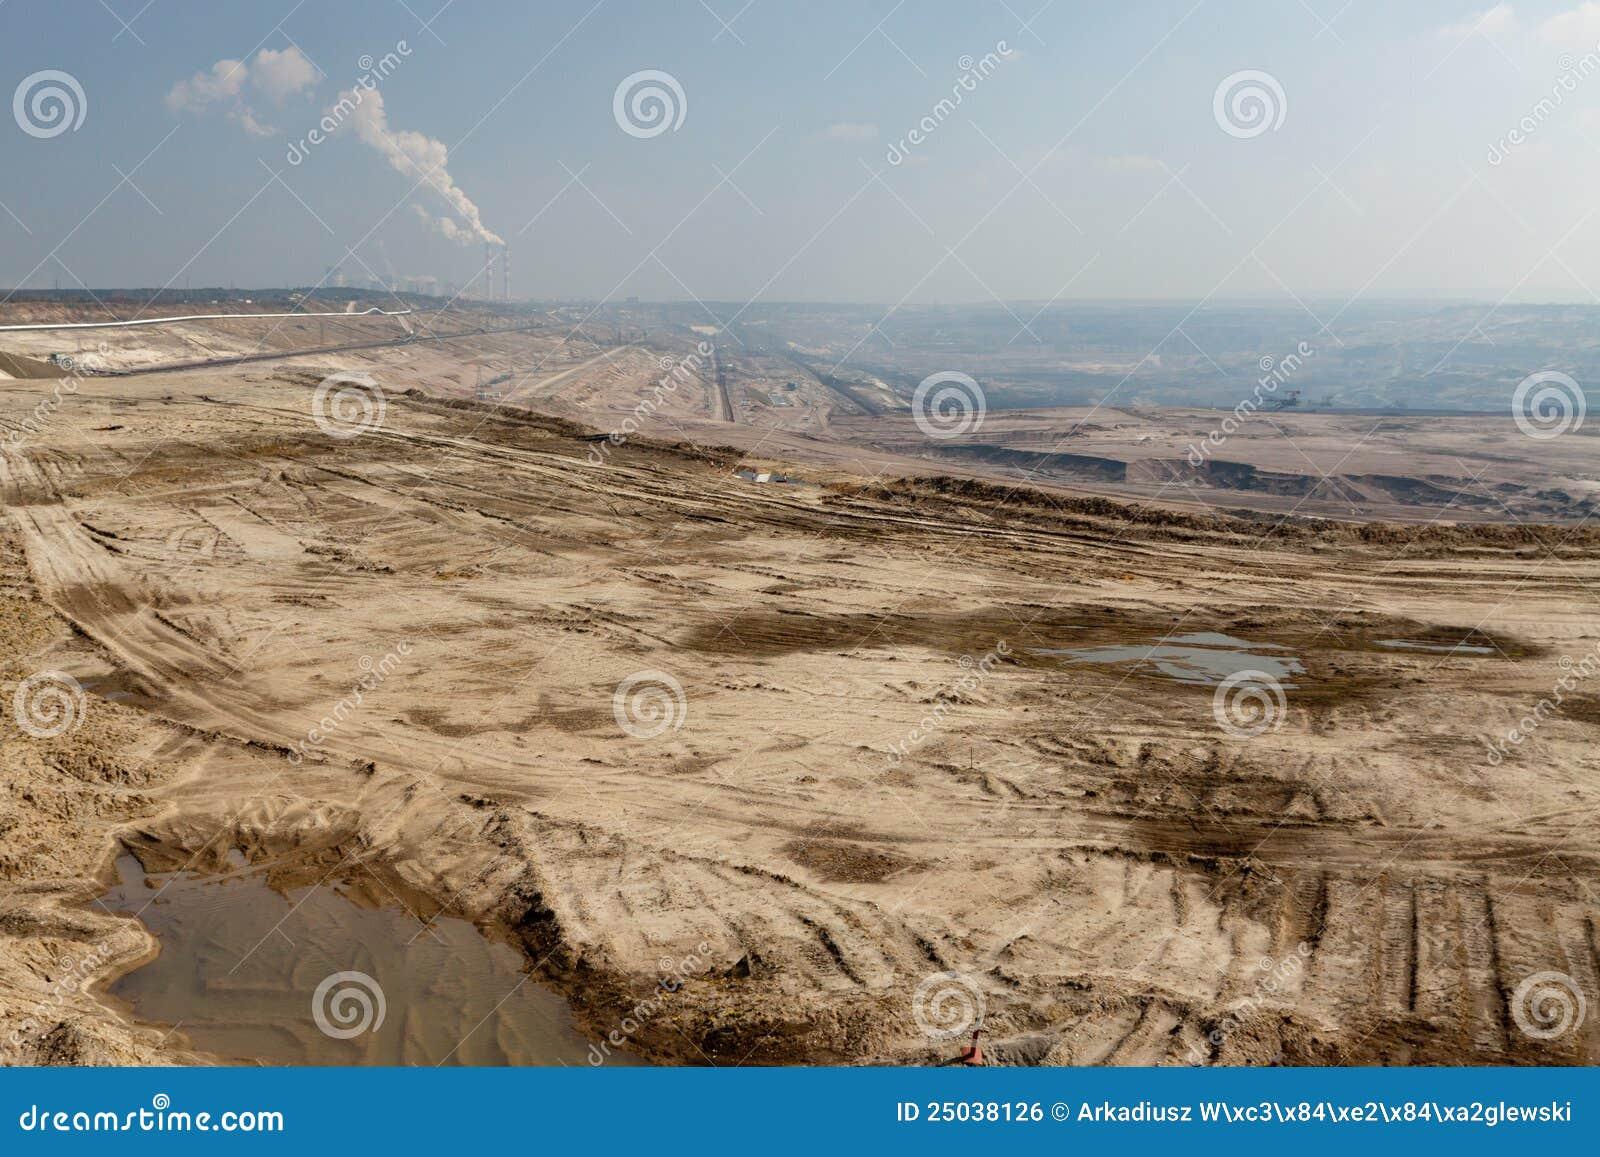 Stripping Ratios Surface Mining Coal Mining And Geology Tattoo Design Bild